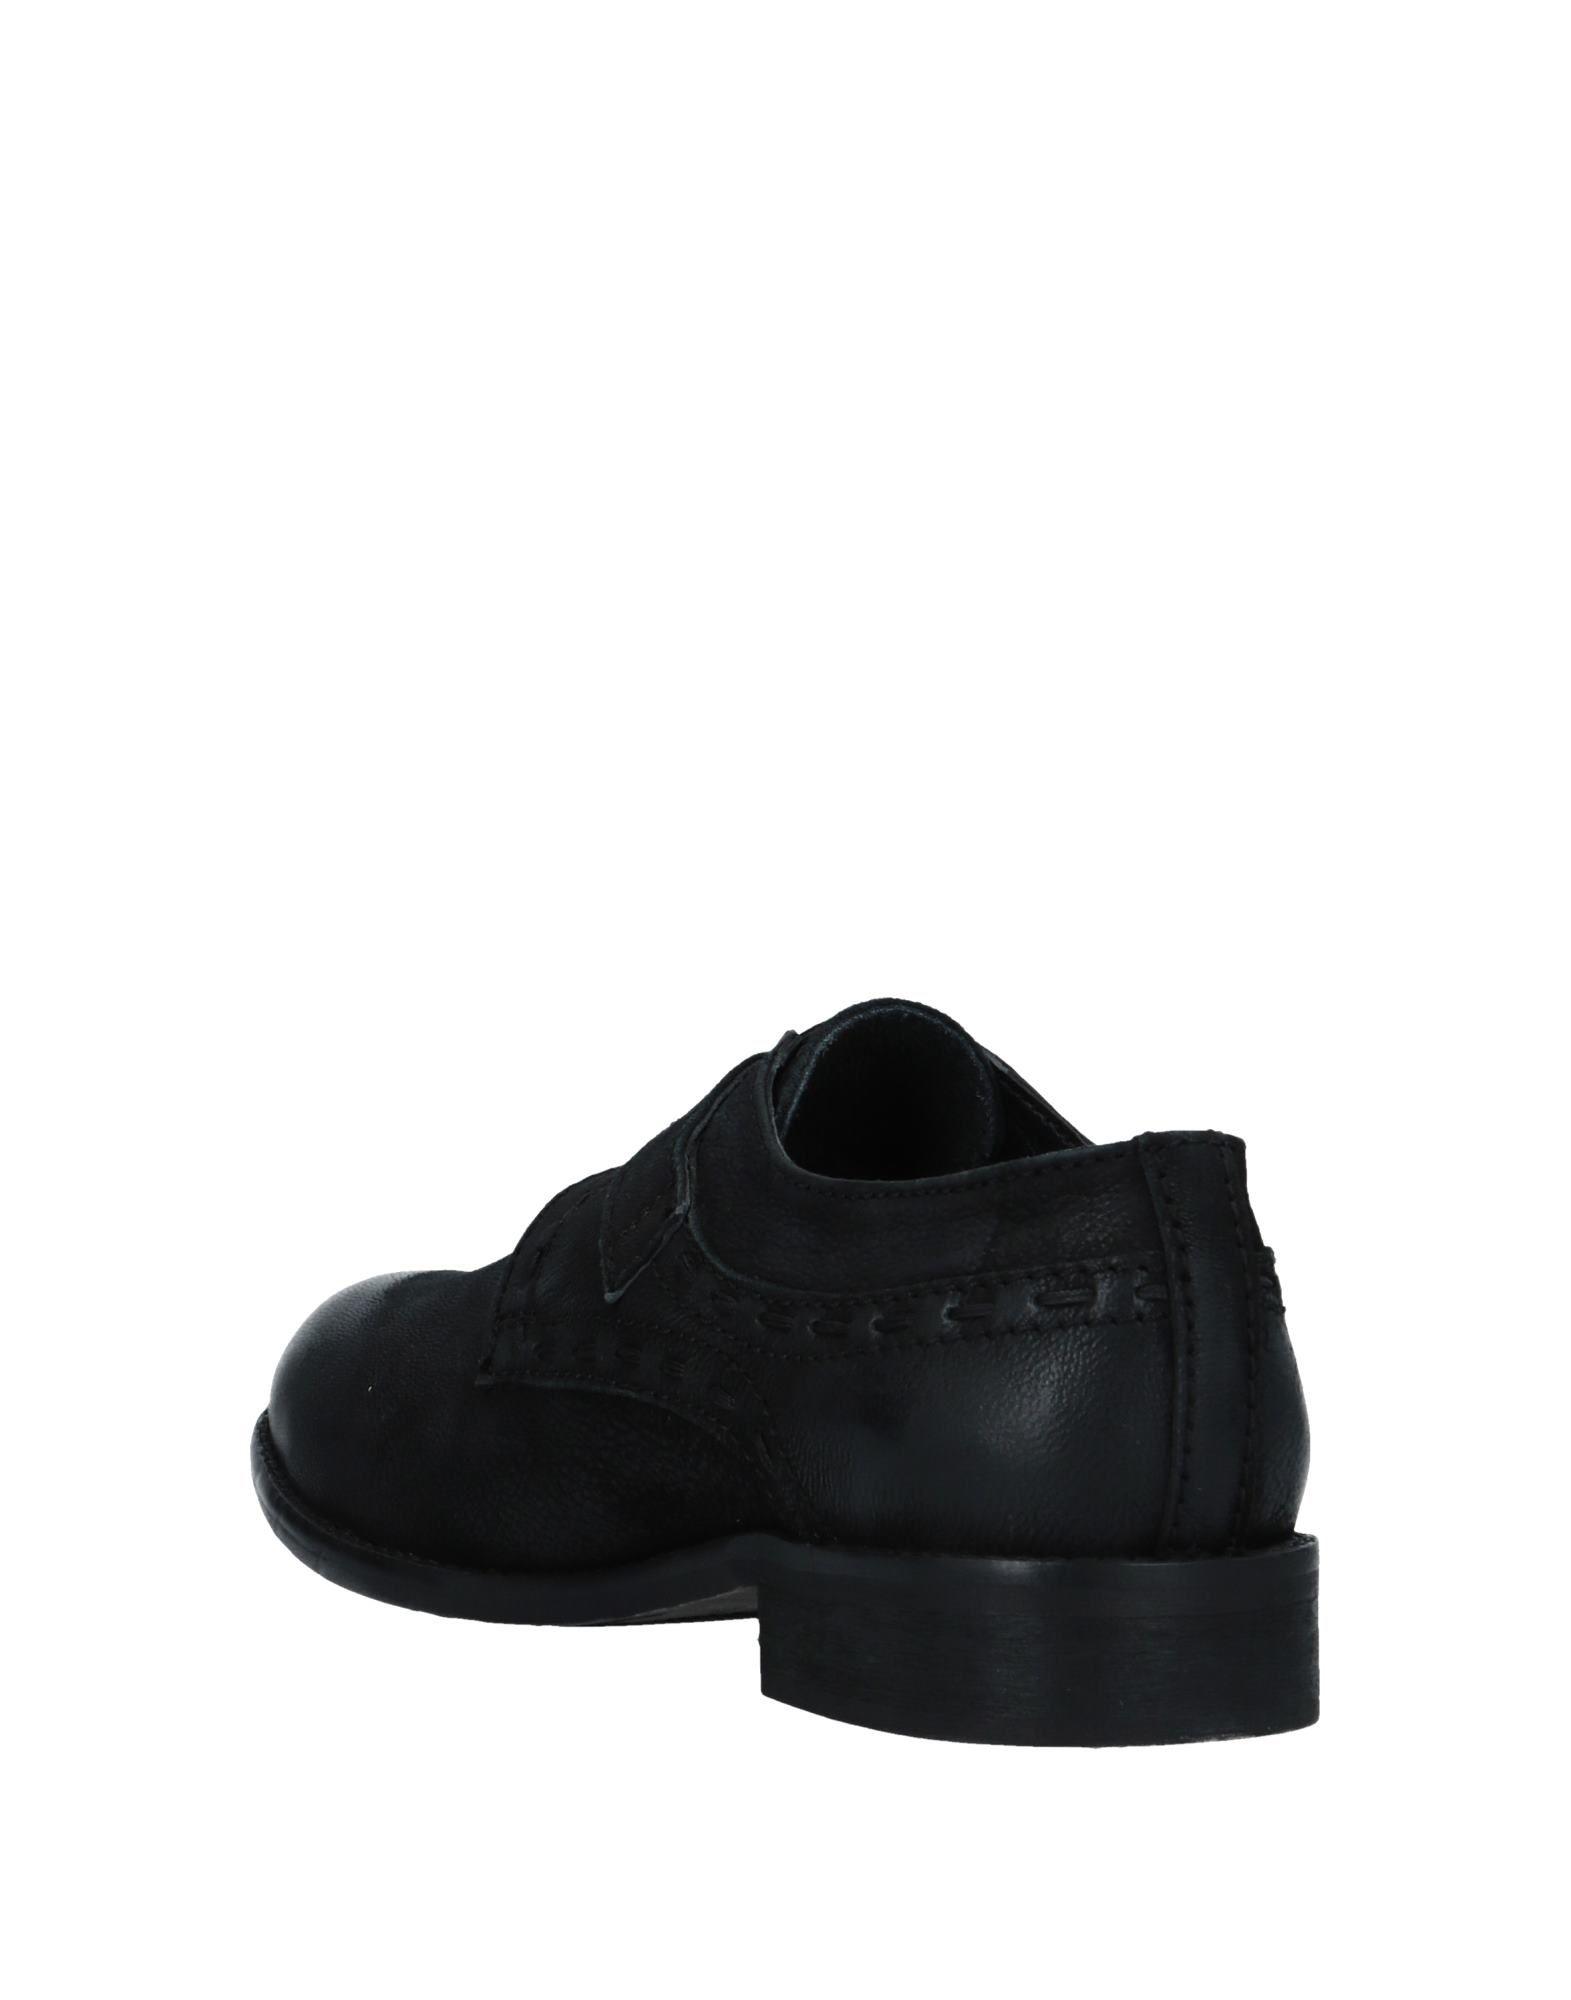 Inuovo Mokassins Damen beliebte  11533003JN Gute Qualität beliebte Damen Schuhe 920489